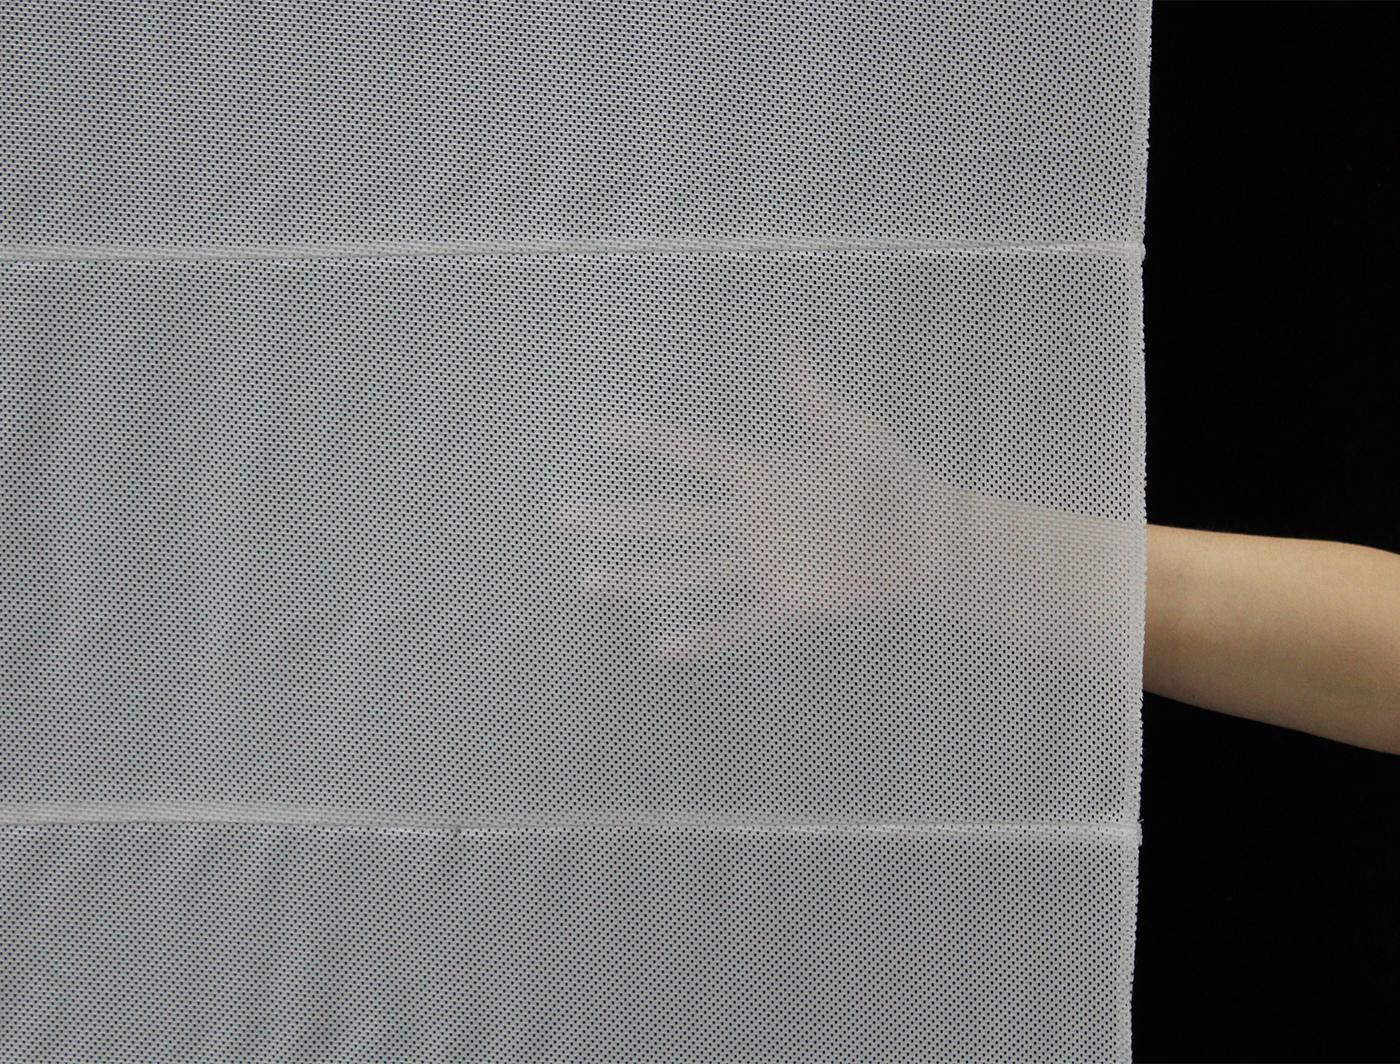 Tuck SuperLever panel in natural light